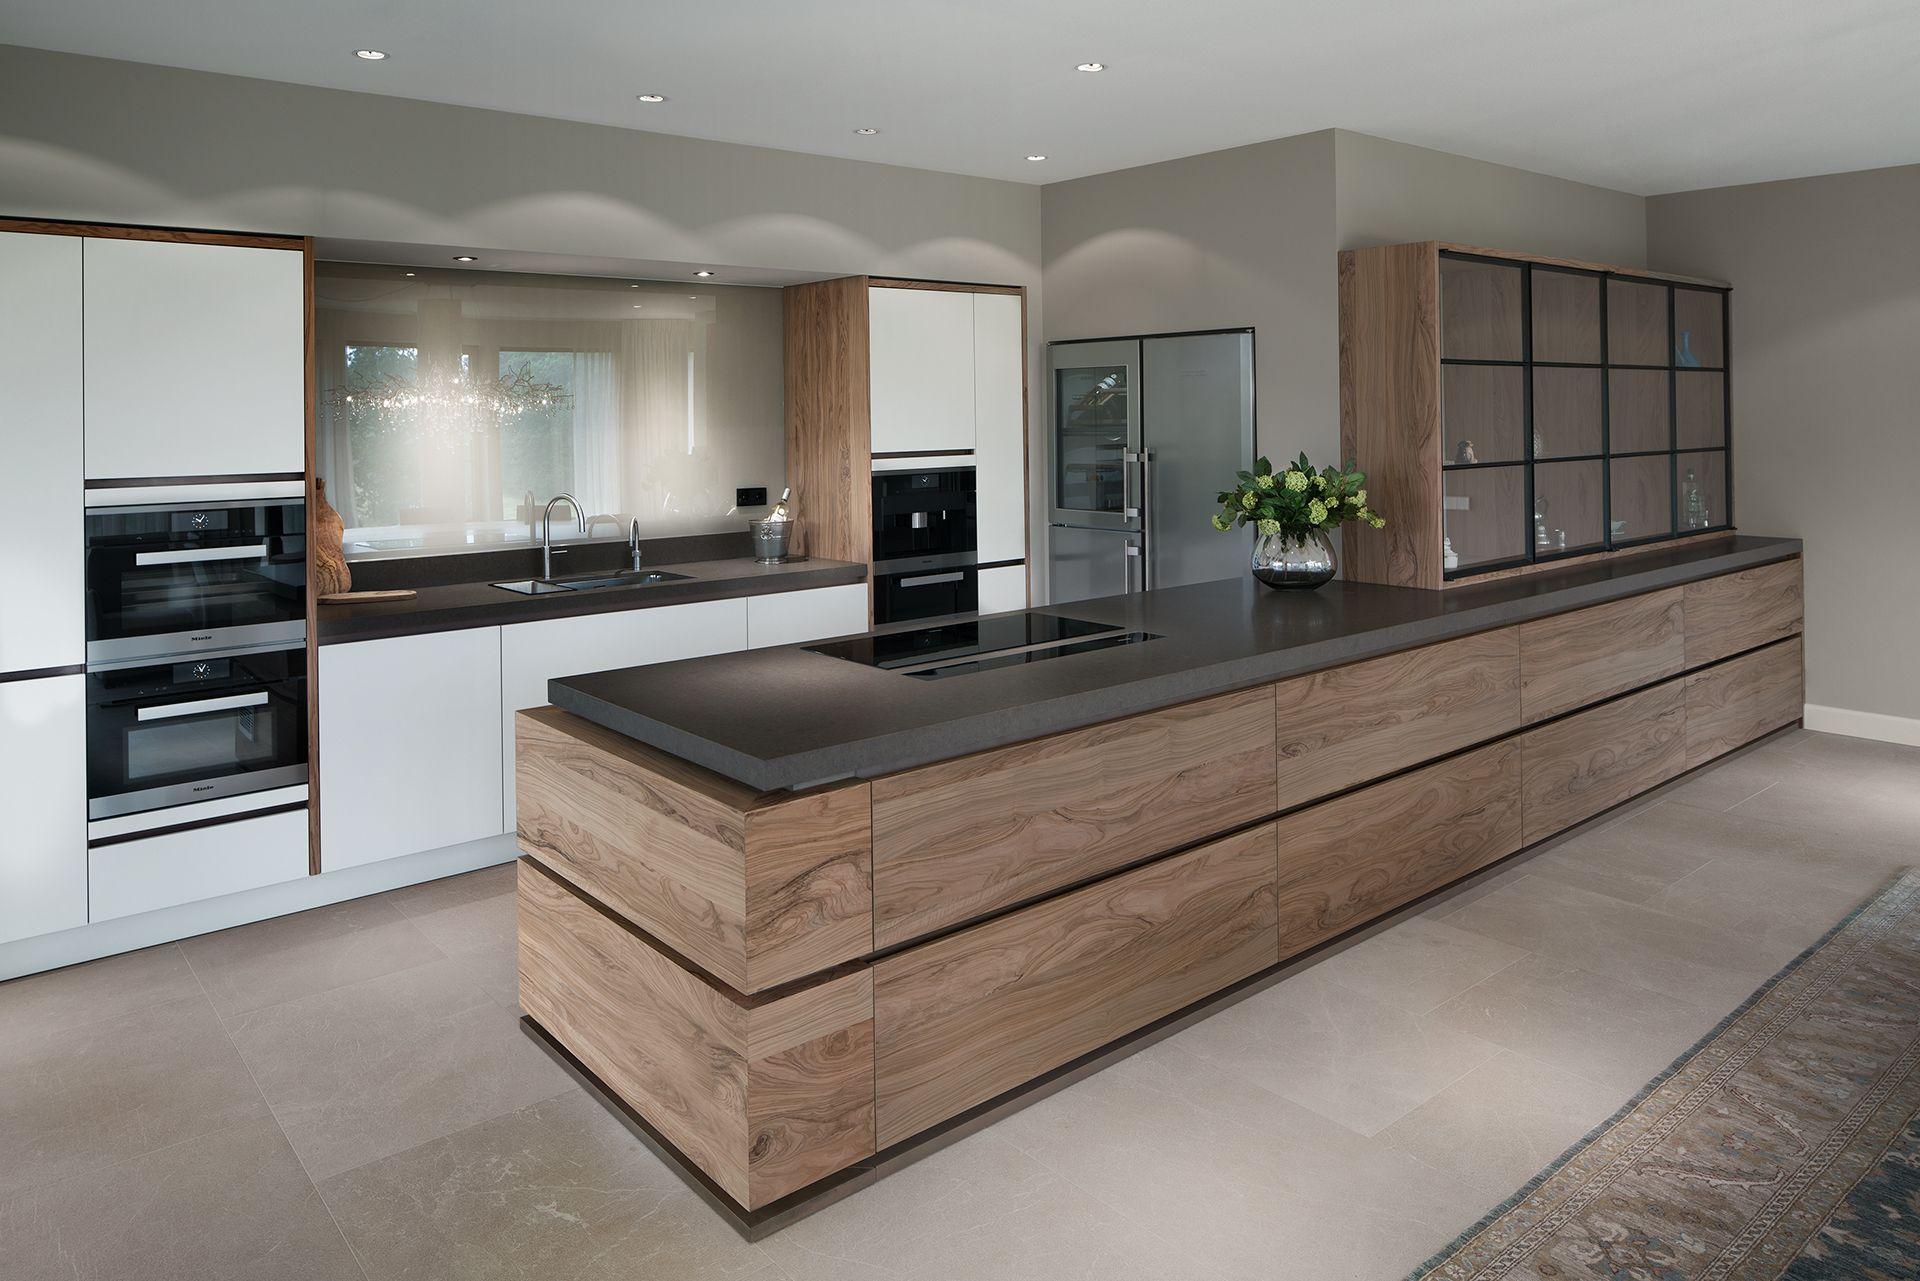 Keuken Van Hout : Pin by anil sharma on kitchen designs in keuken